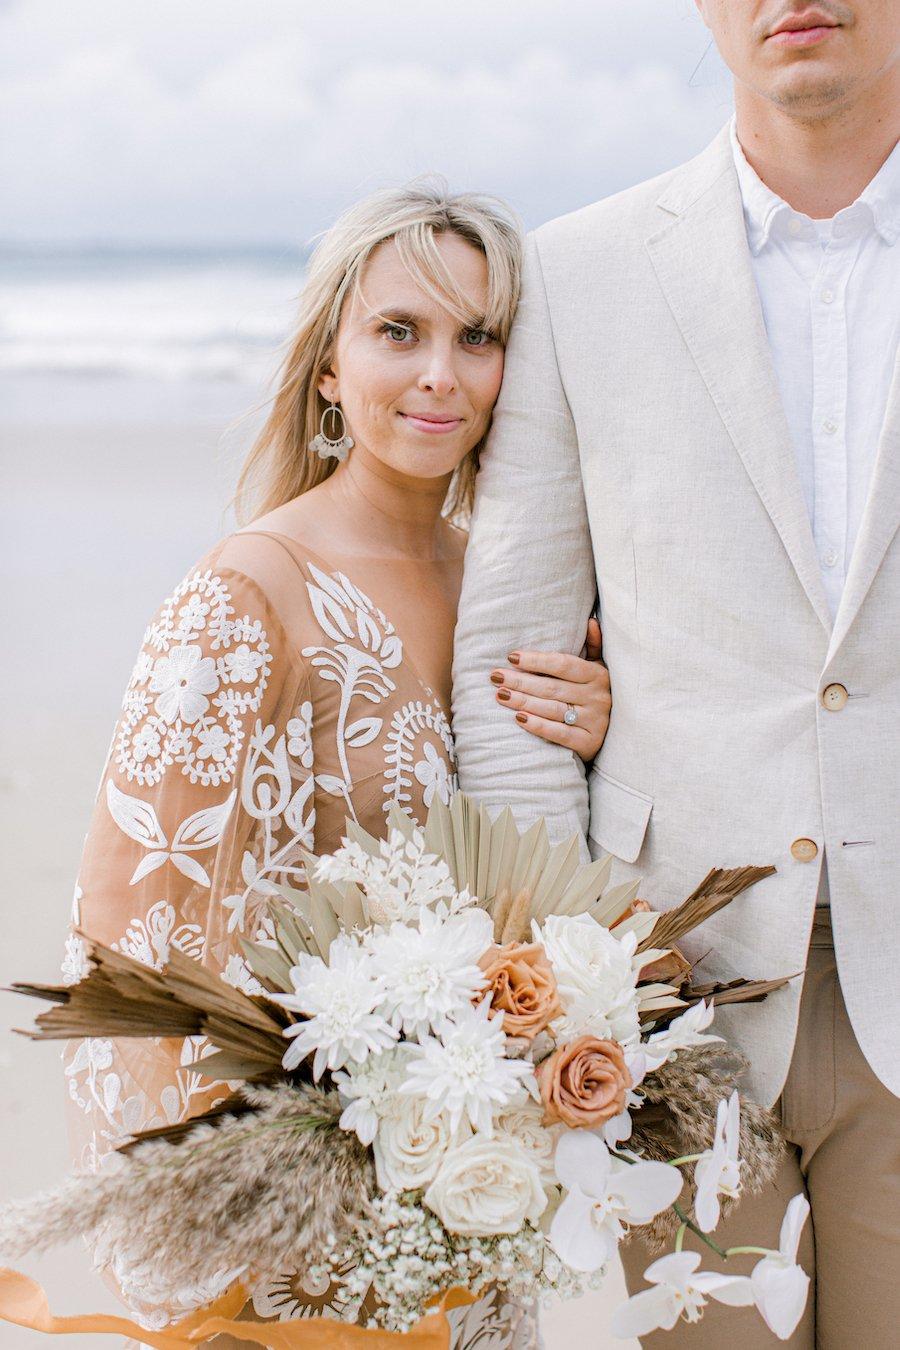 bride and groom on beach cuddling